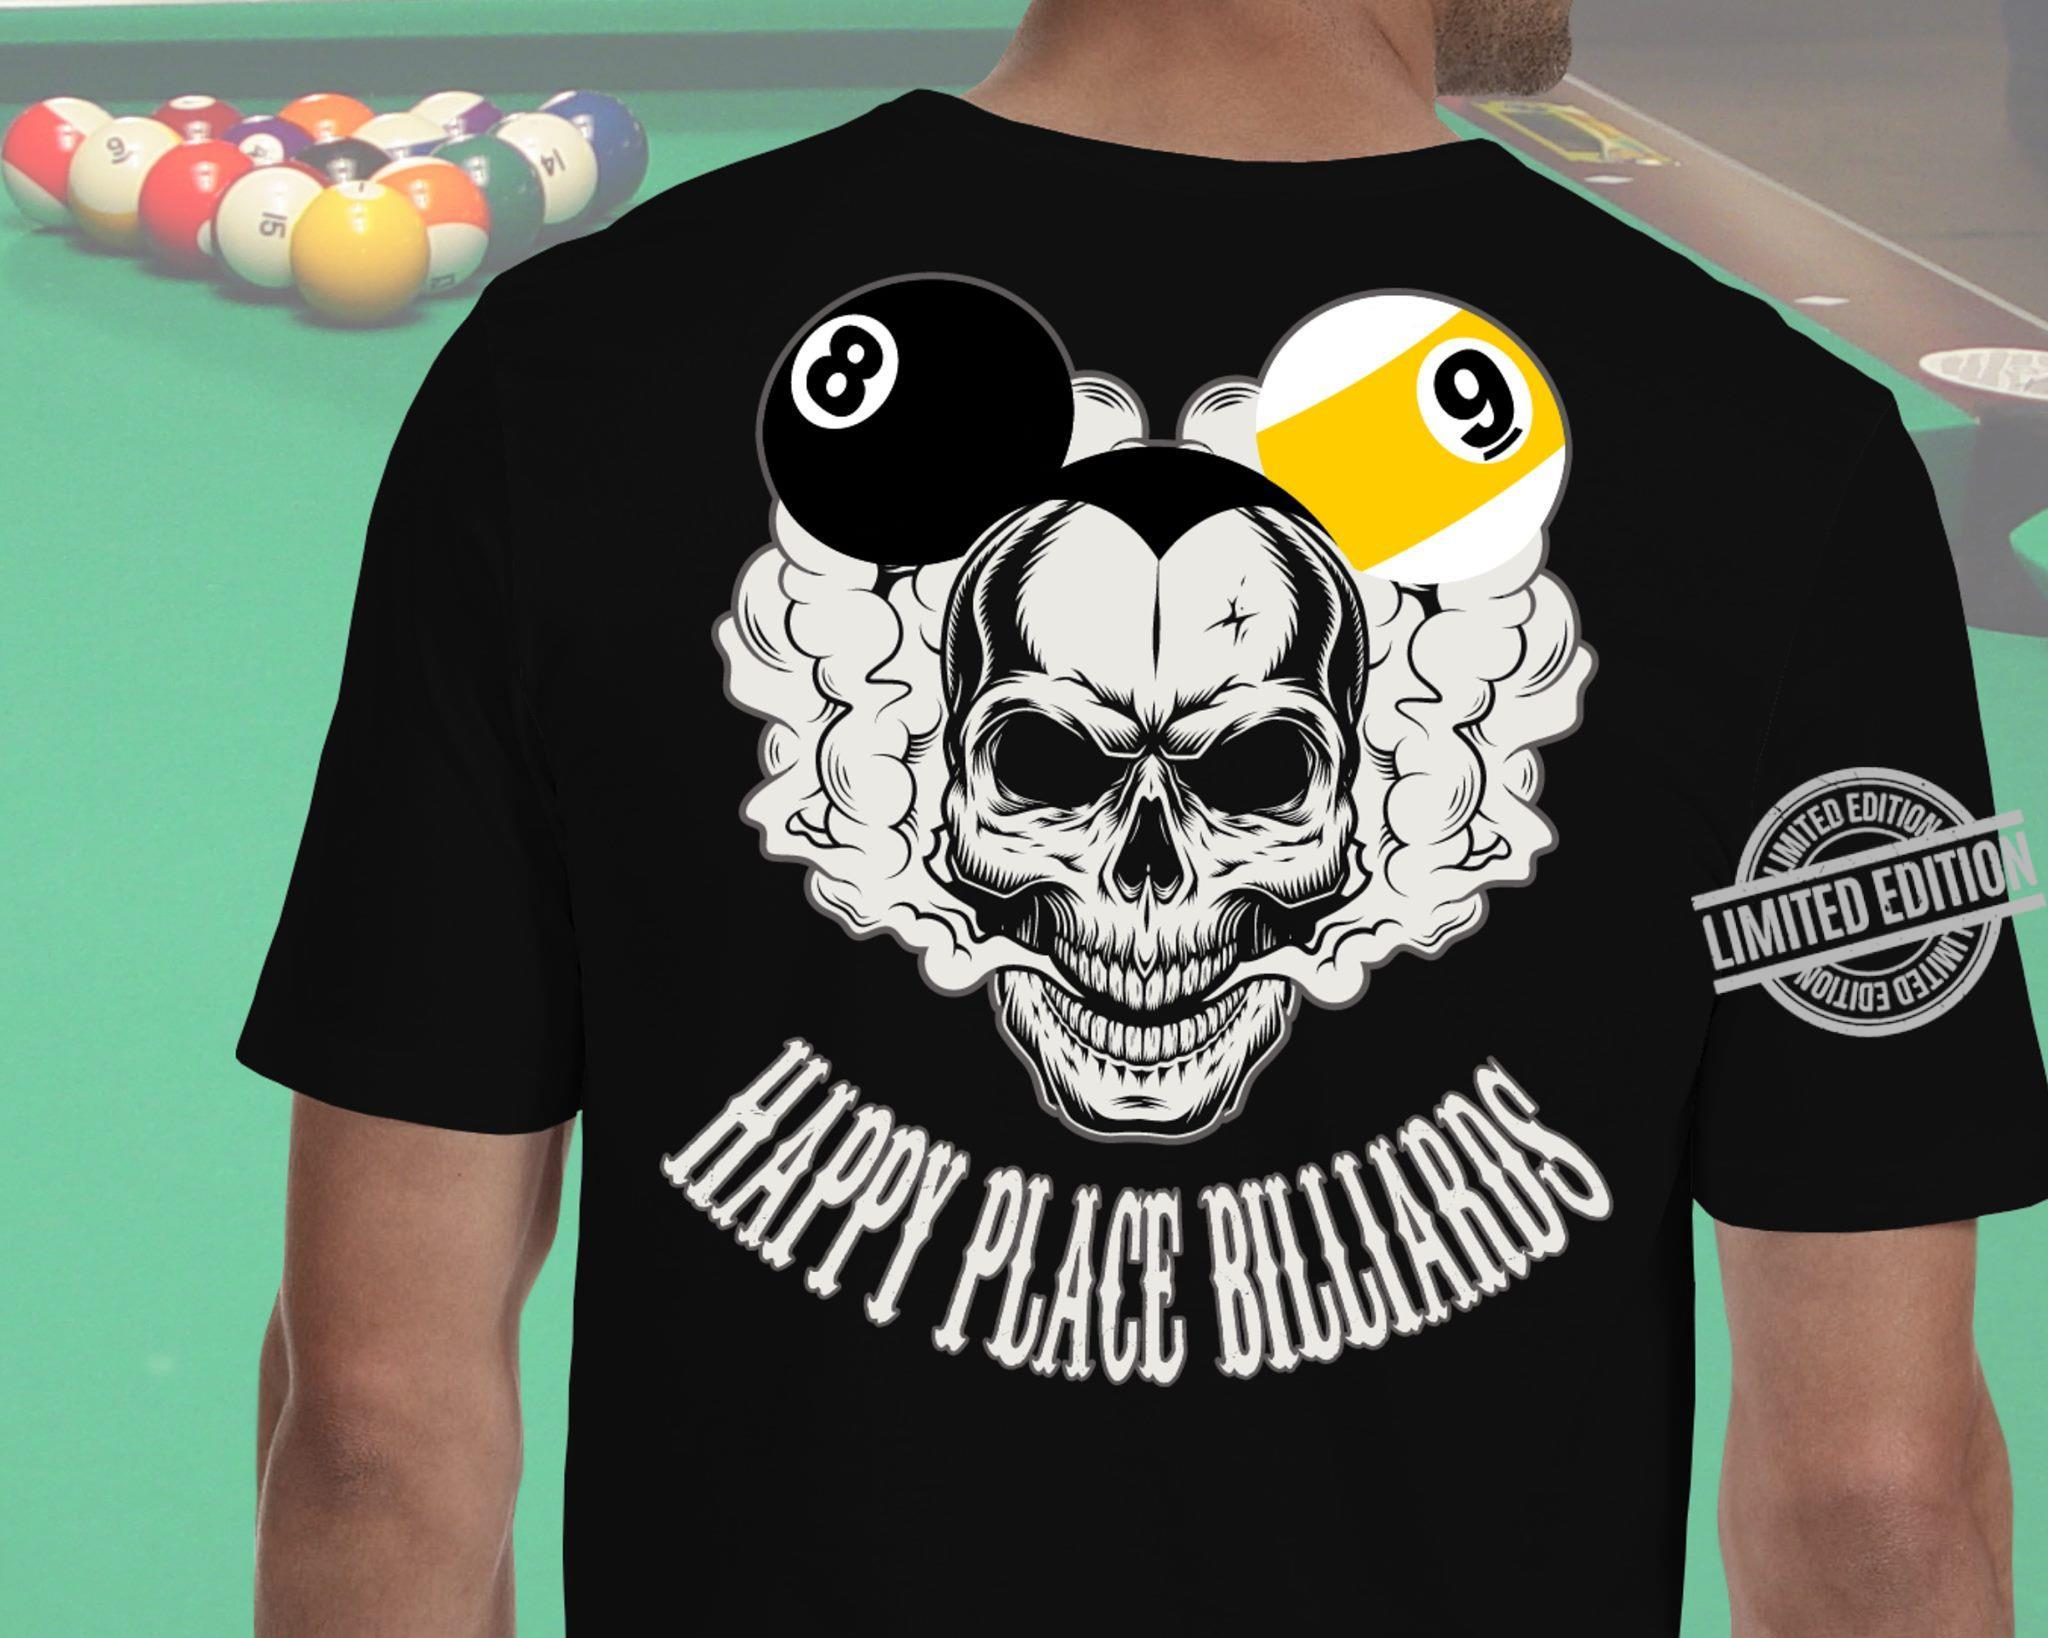 Happy Place Billards Shirt